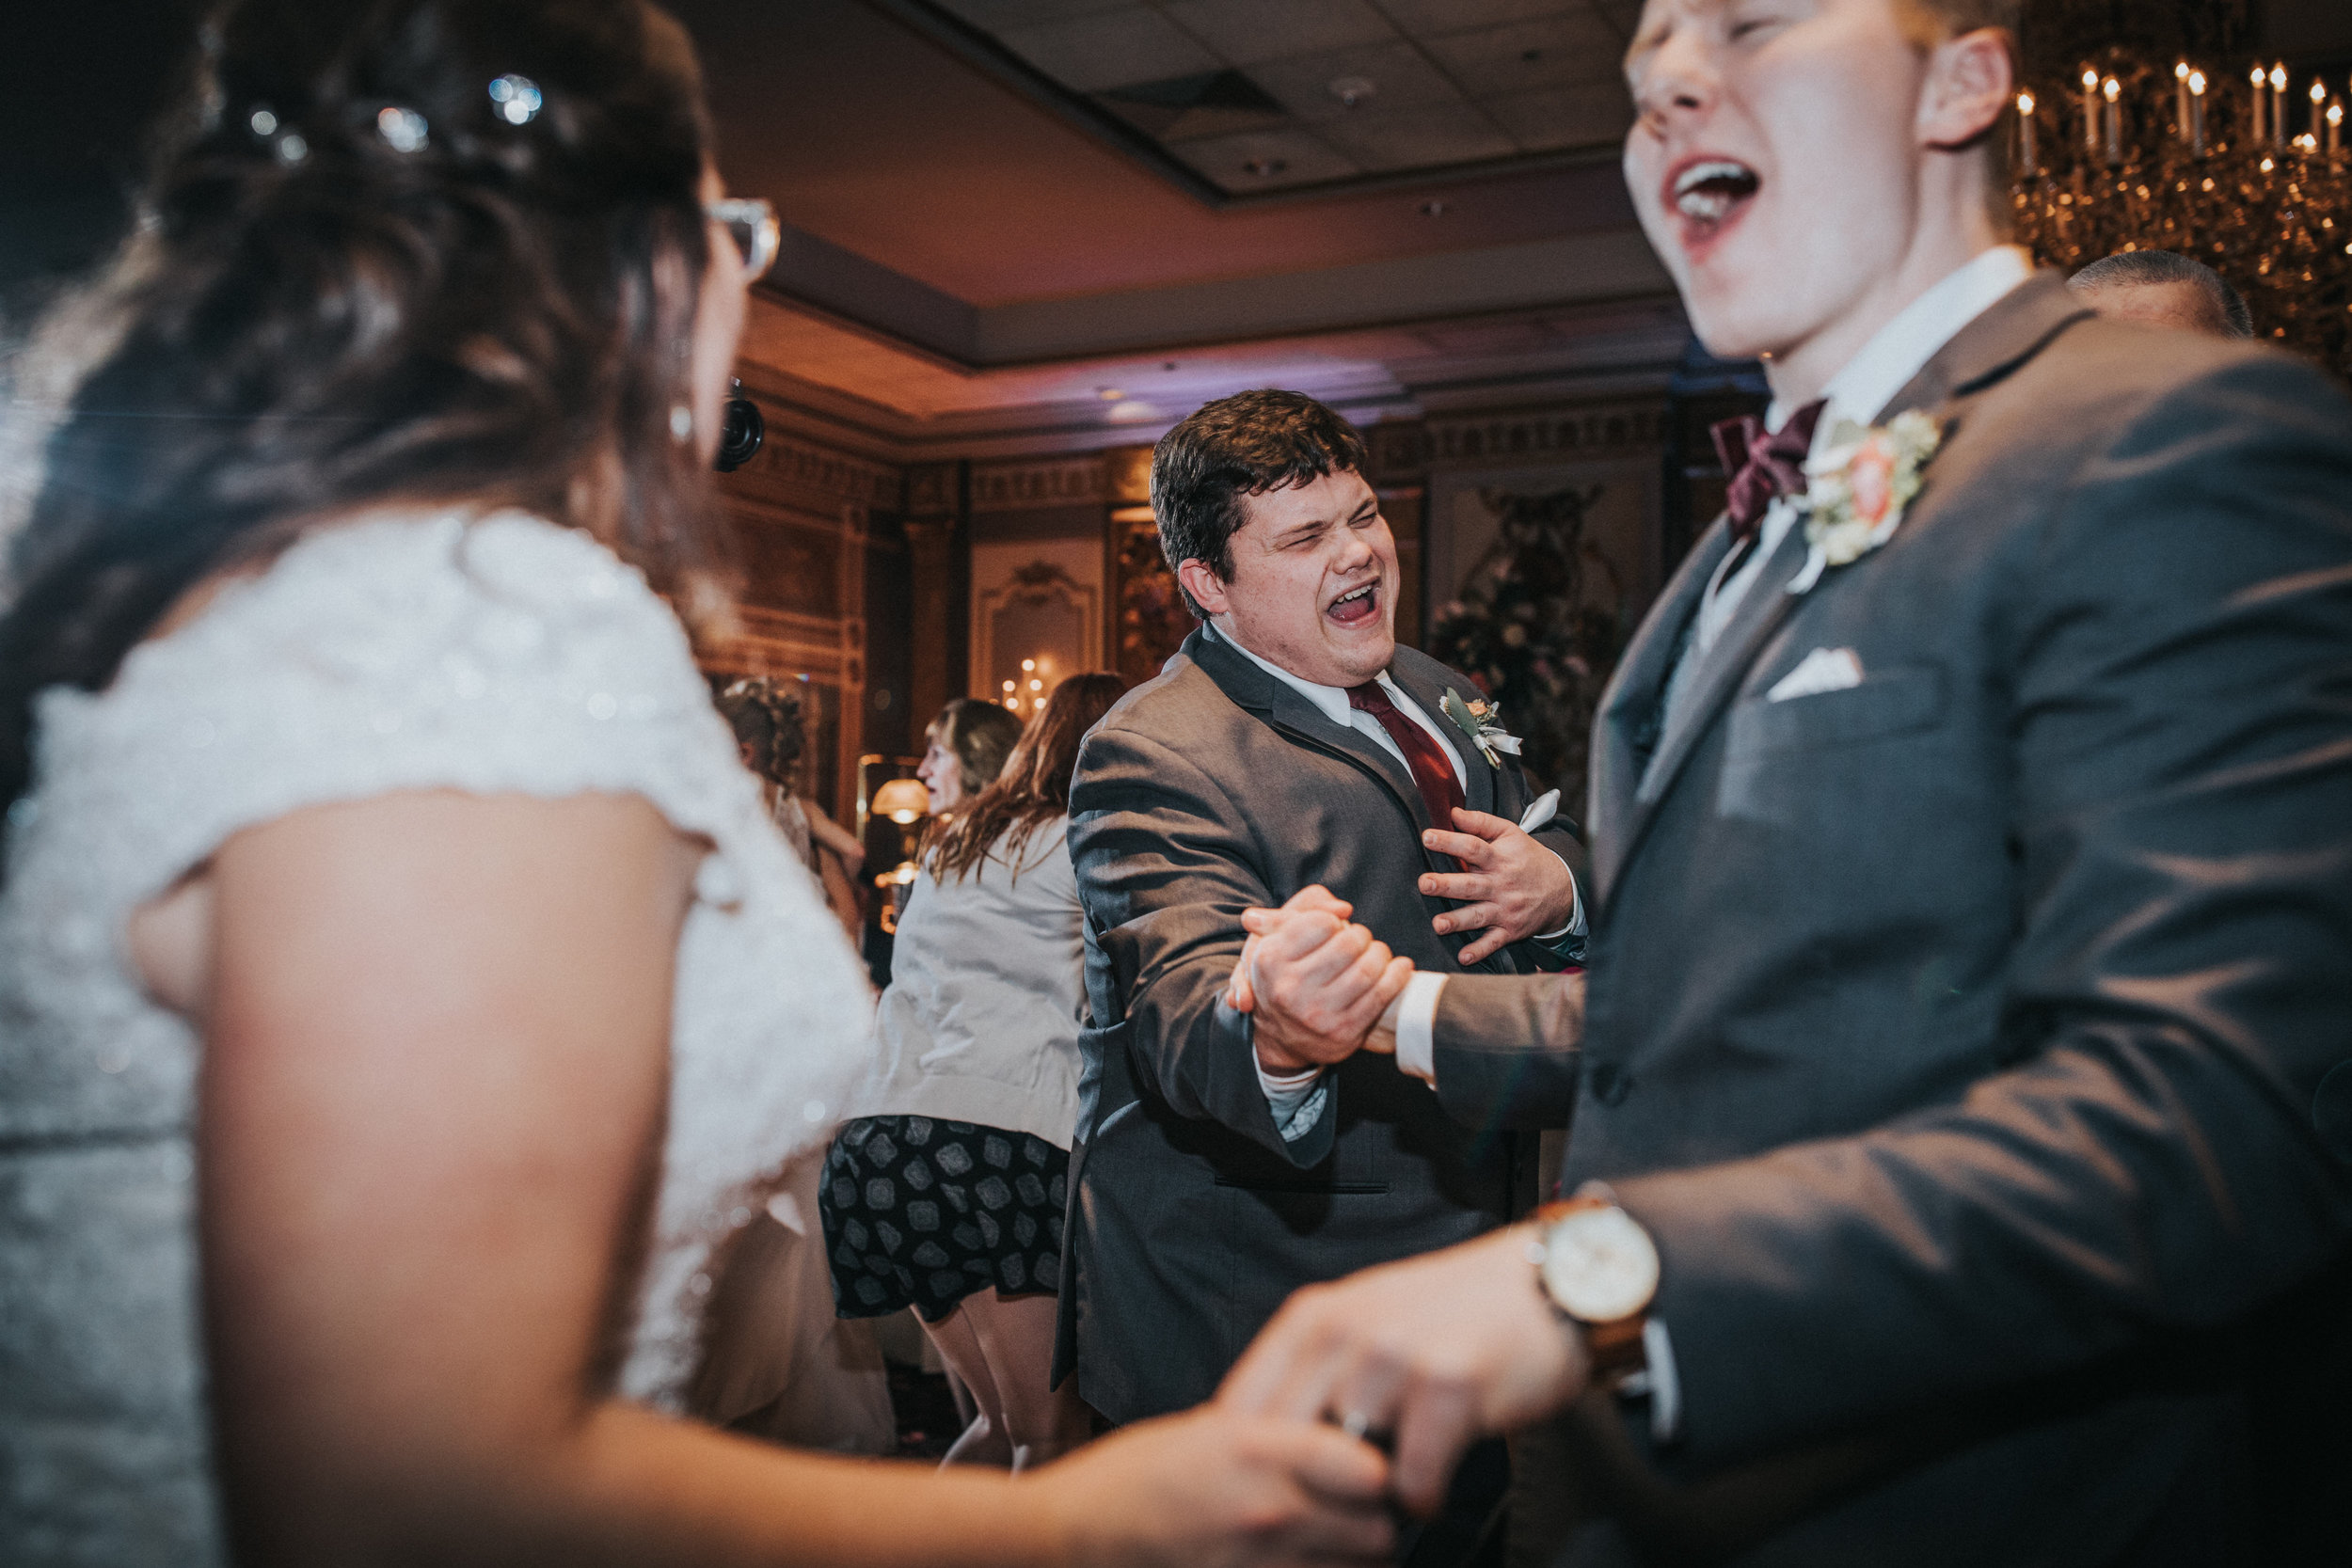 New-Jersey-Wedding-Photography-Fishers-Tudor-House-JennaLynnPhotography-Reception-Kathleen&Eddie-54.jpg